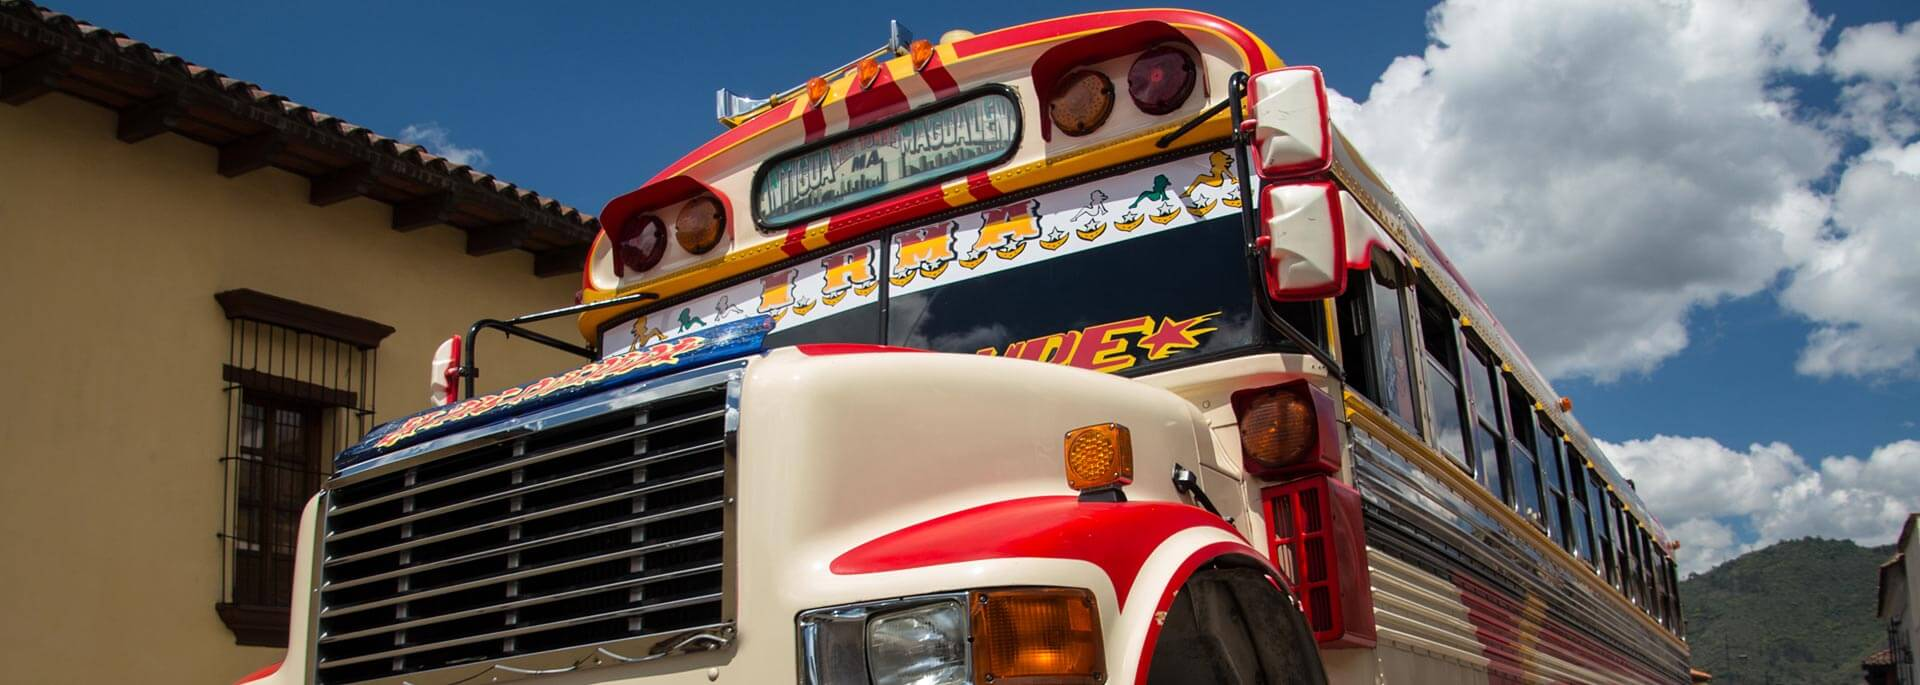 Guatemalas Straßen: Chicken Bus und anderes Buntes